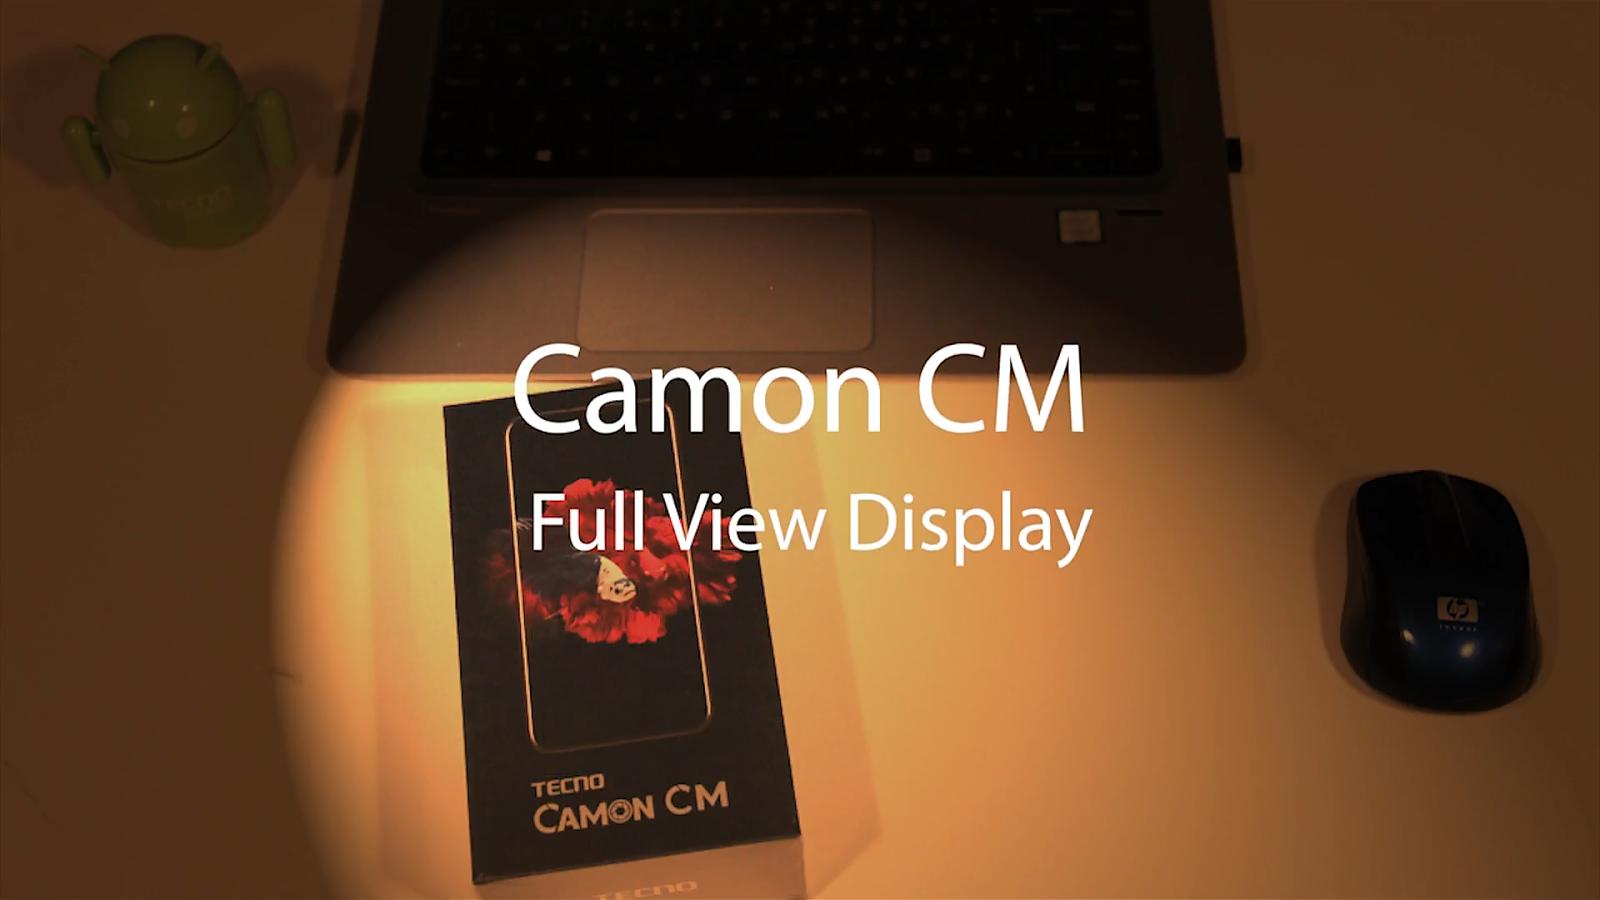 Tecno Camon CM smartphone